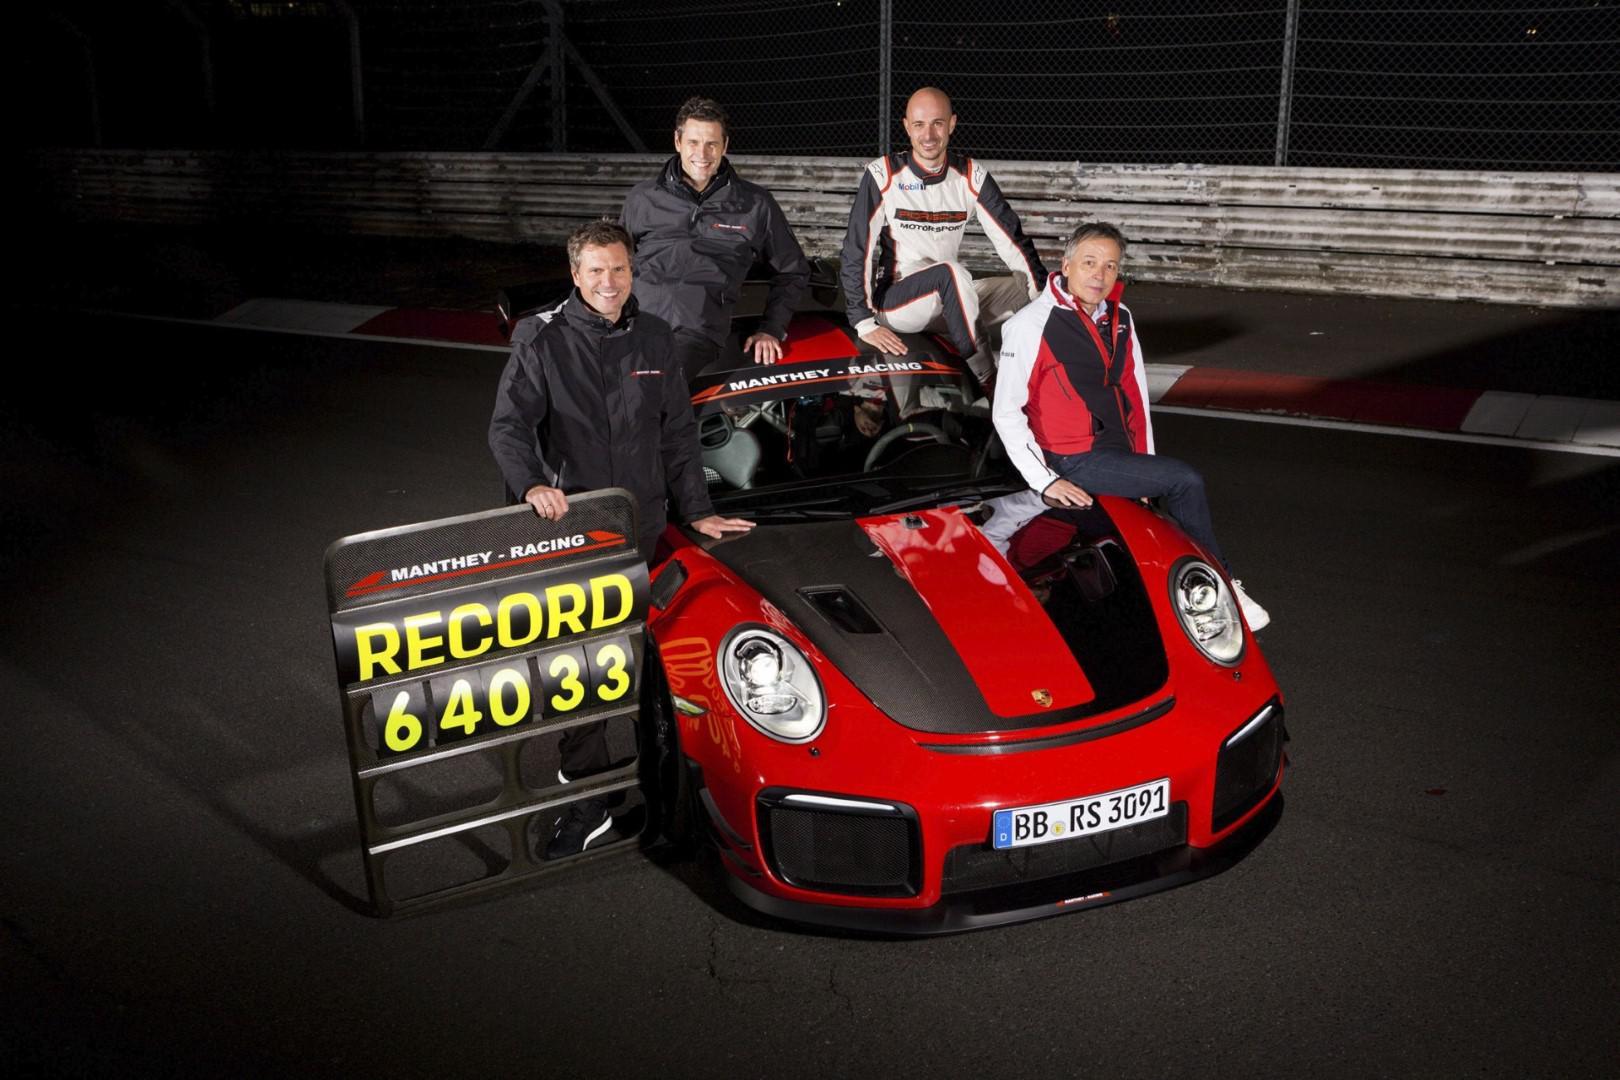 Vidéo: Porsche 911 GT2 RS MR la nouvelle reine du Ring du Nürburgring